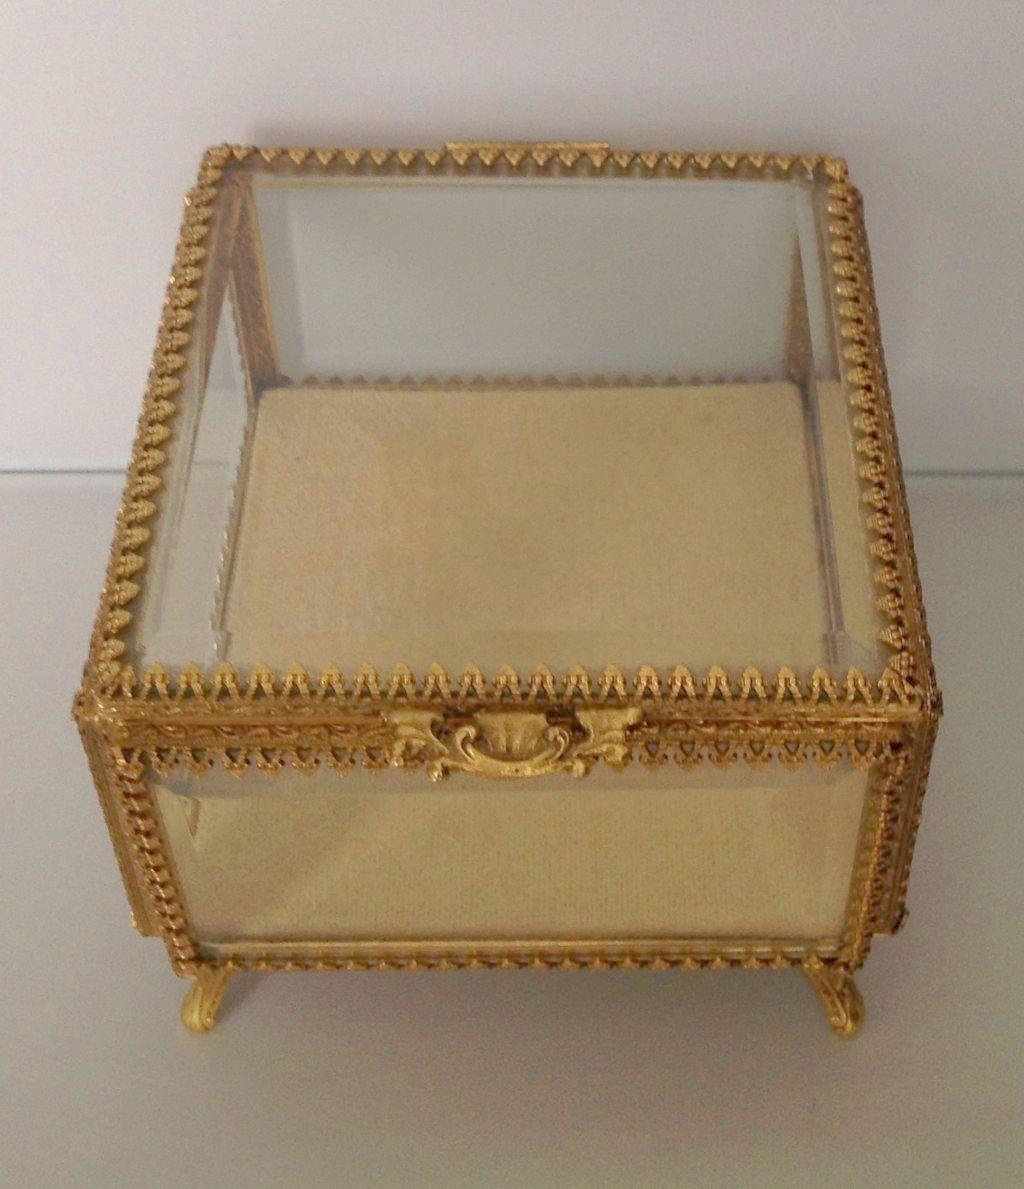 Vintage Stylebuilt Jewelry Casket Box Ormolu Gold